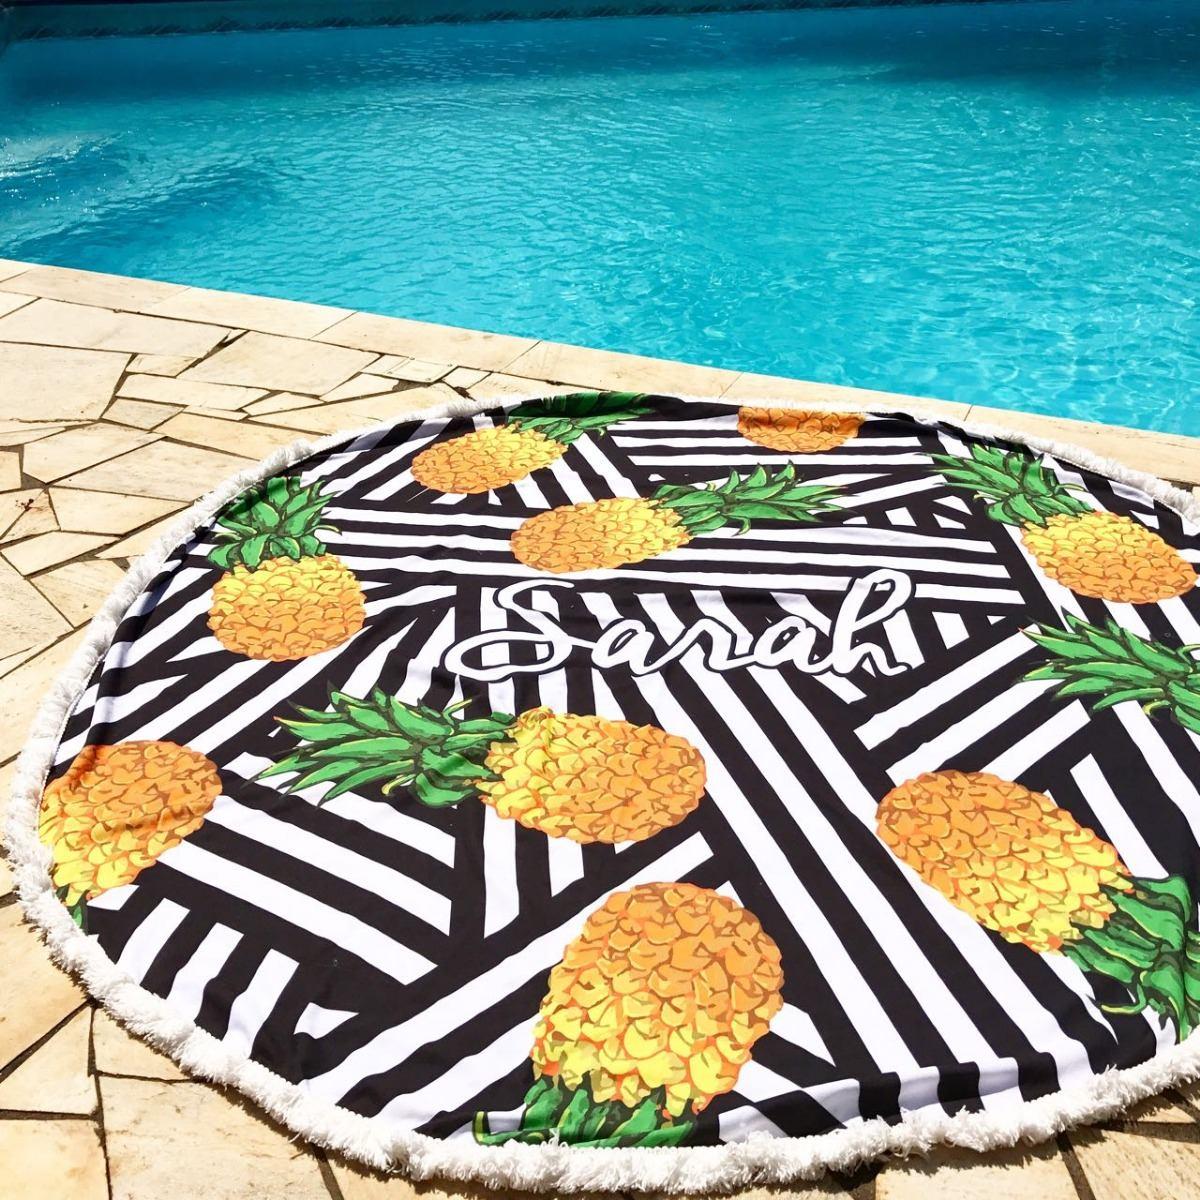 1e92f1633 canga redonda personalizada | canga praia abacaxi geométrico. Carregando  zoom.